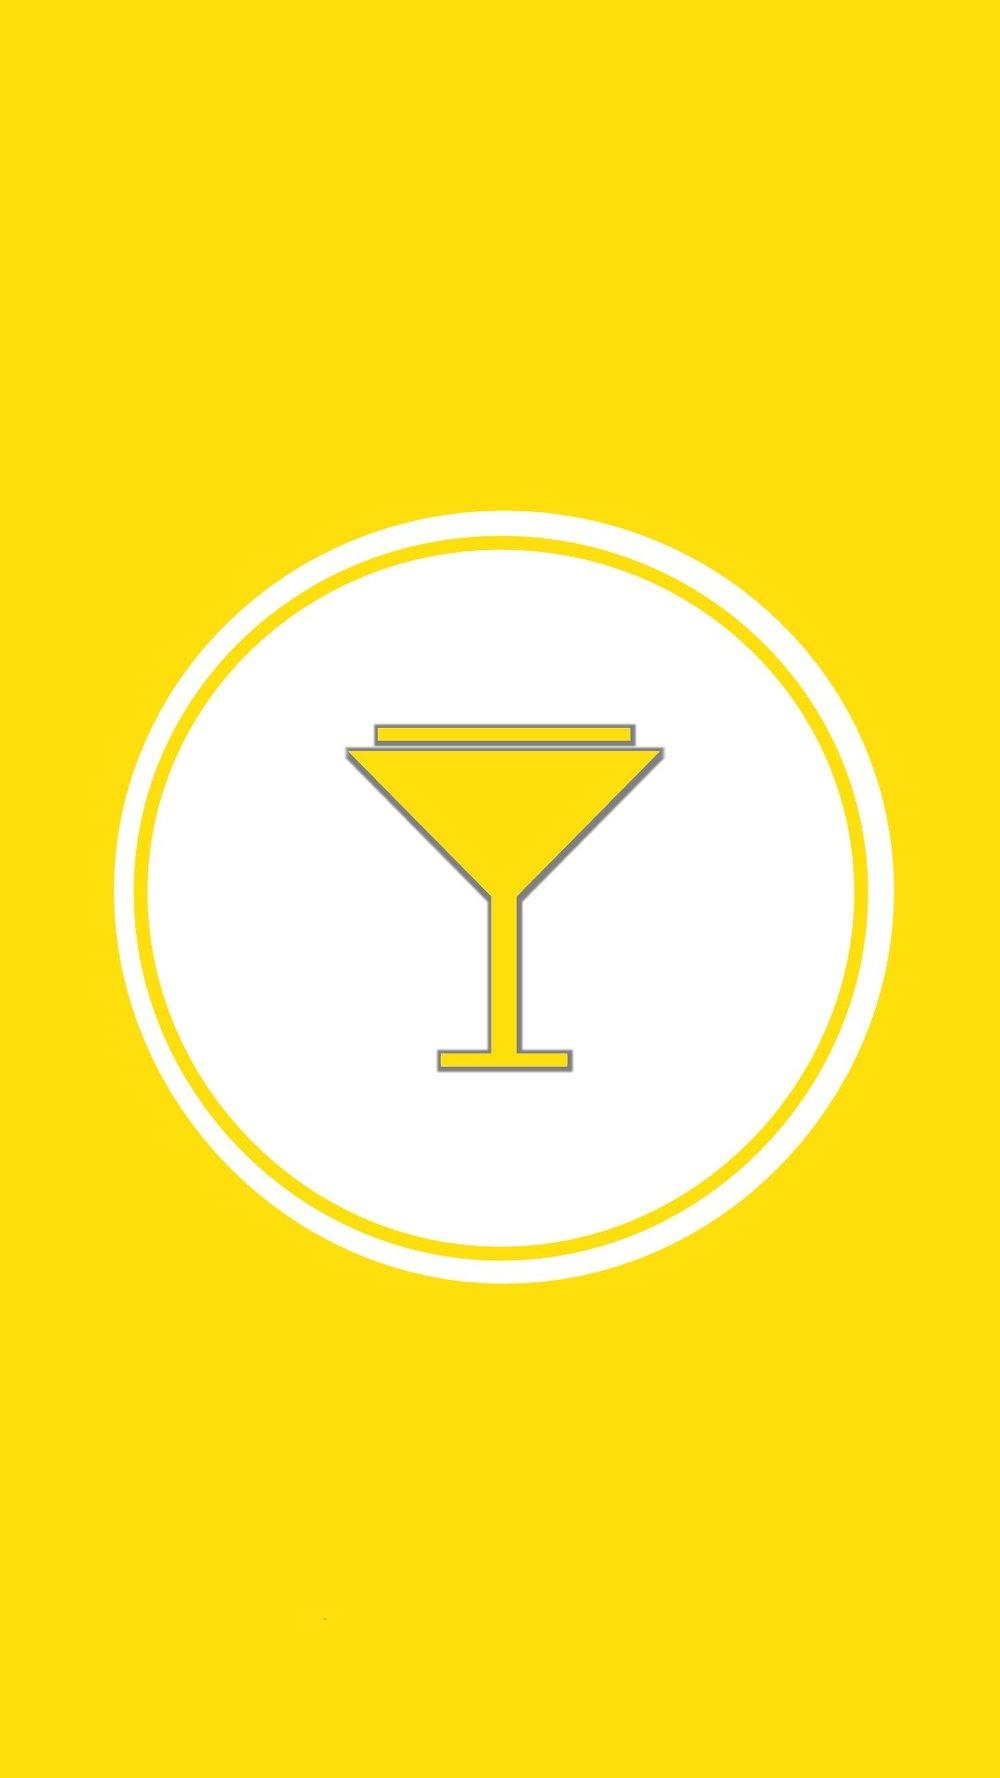 Instagram-cover-martini-yellow-lotnotes.com.jpg